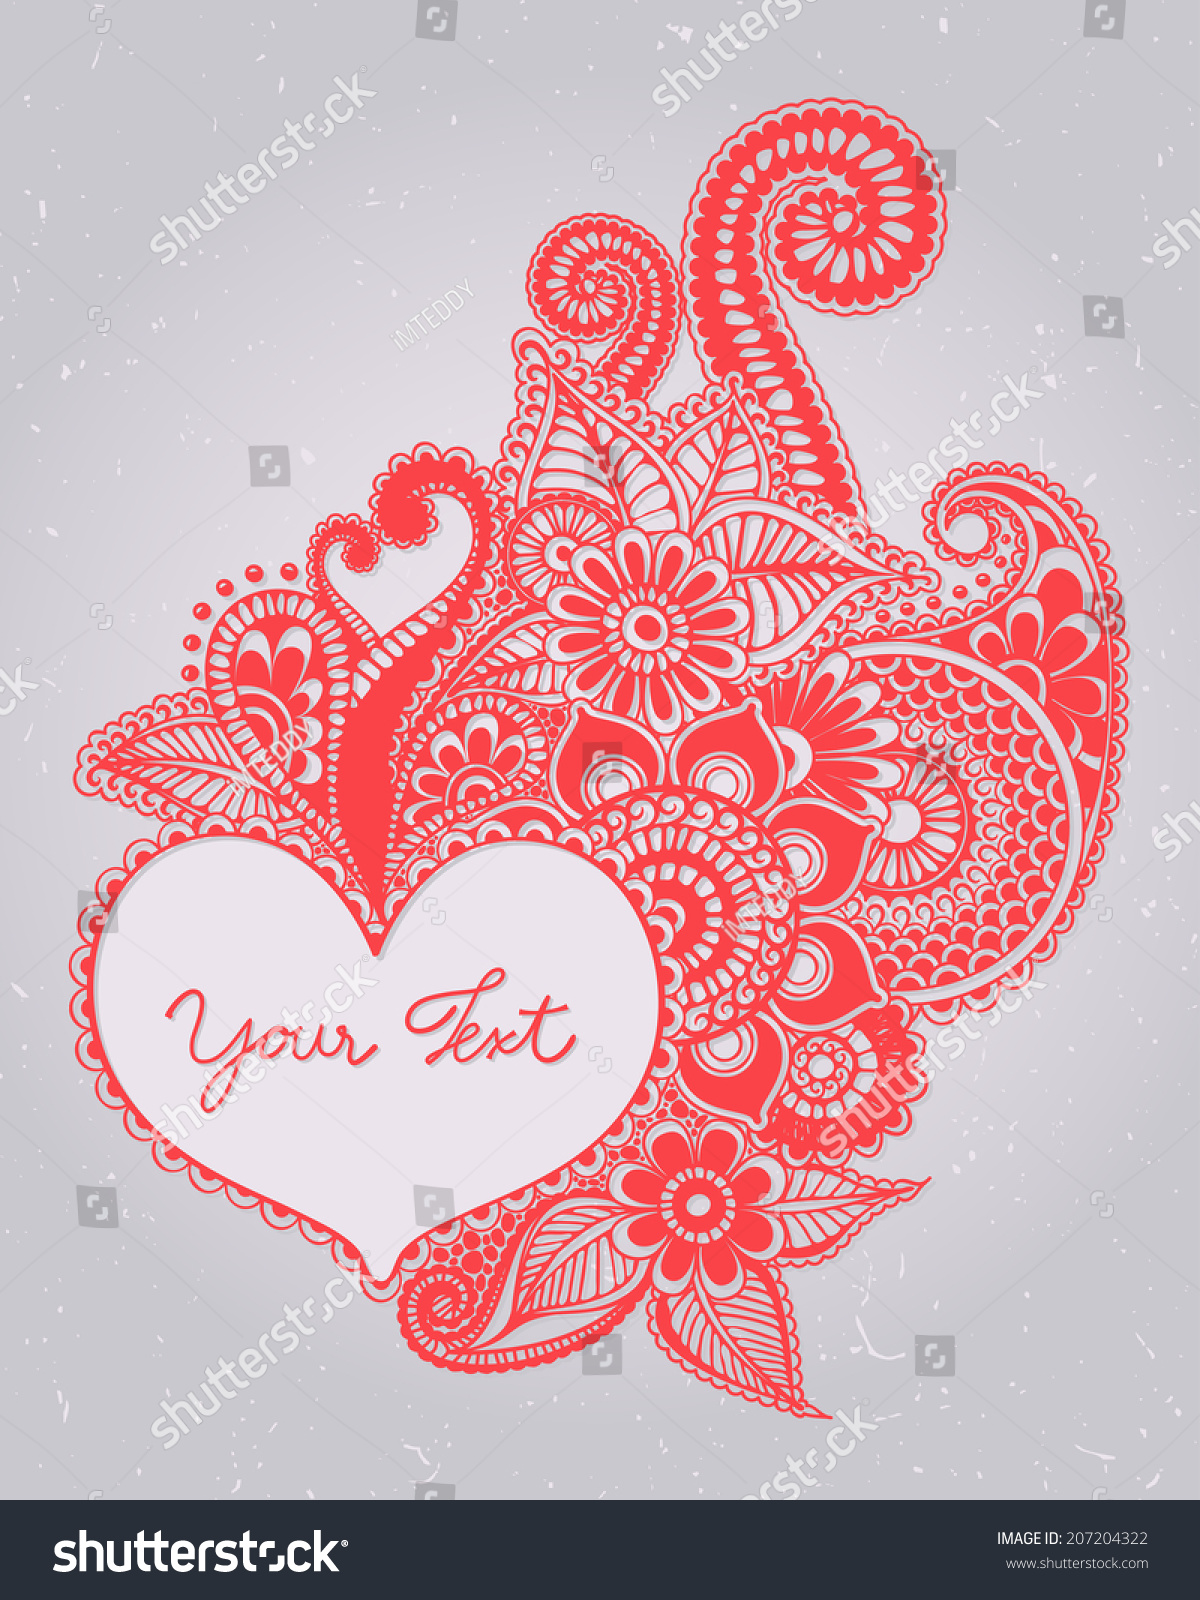 Heart Henna Mehndi Valentines Day Doodles Stock Vector 207204322 ...